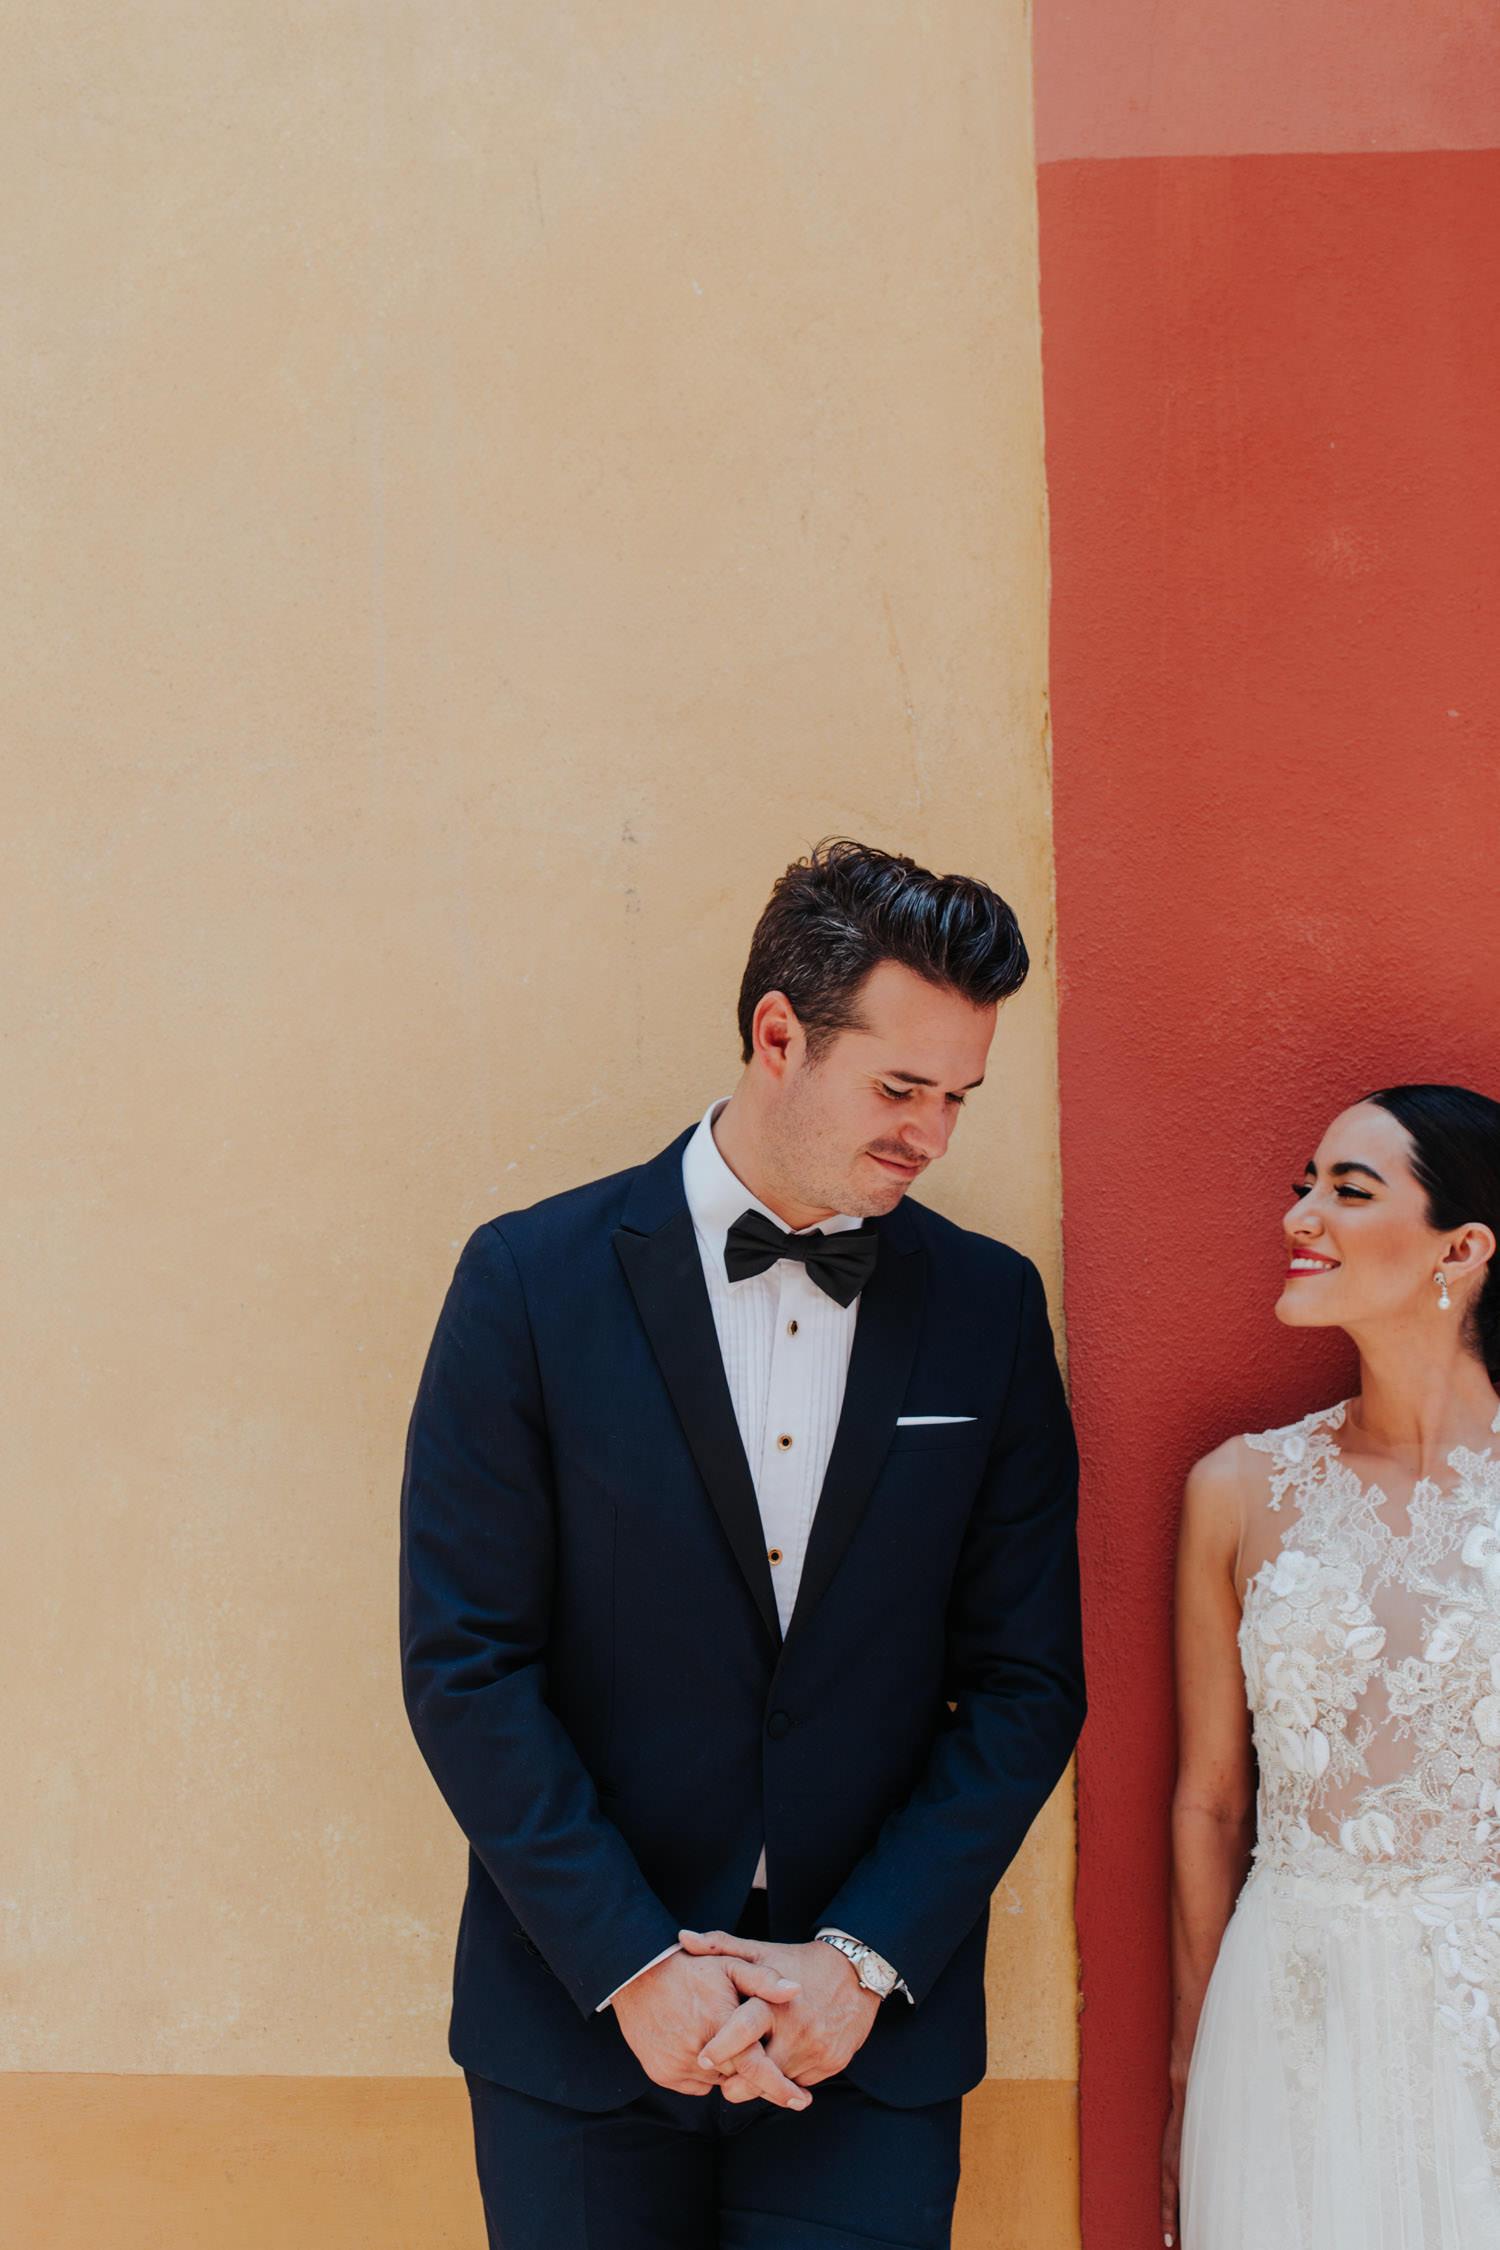 San-Miguel-de-Allende-Wedding-Photography-Parroquia-Instituto-Boda-Fotografia-Fer-Sergio-Pierce-Lifestyle-Photography0132.JPG